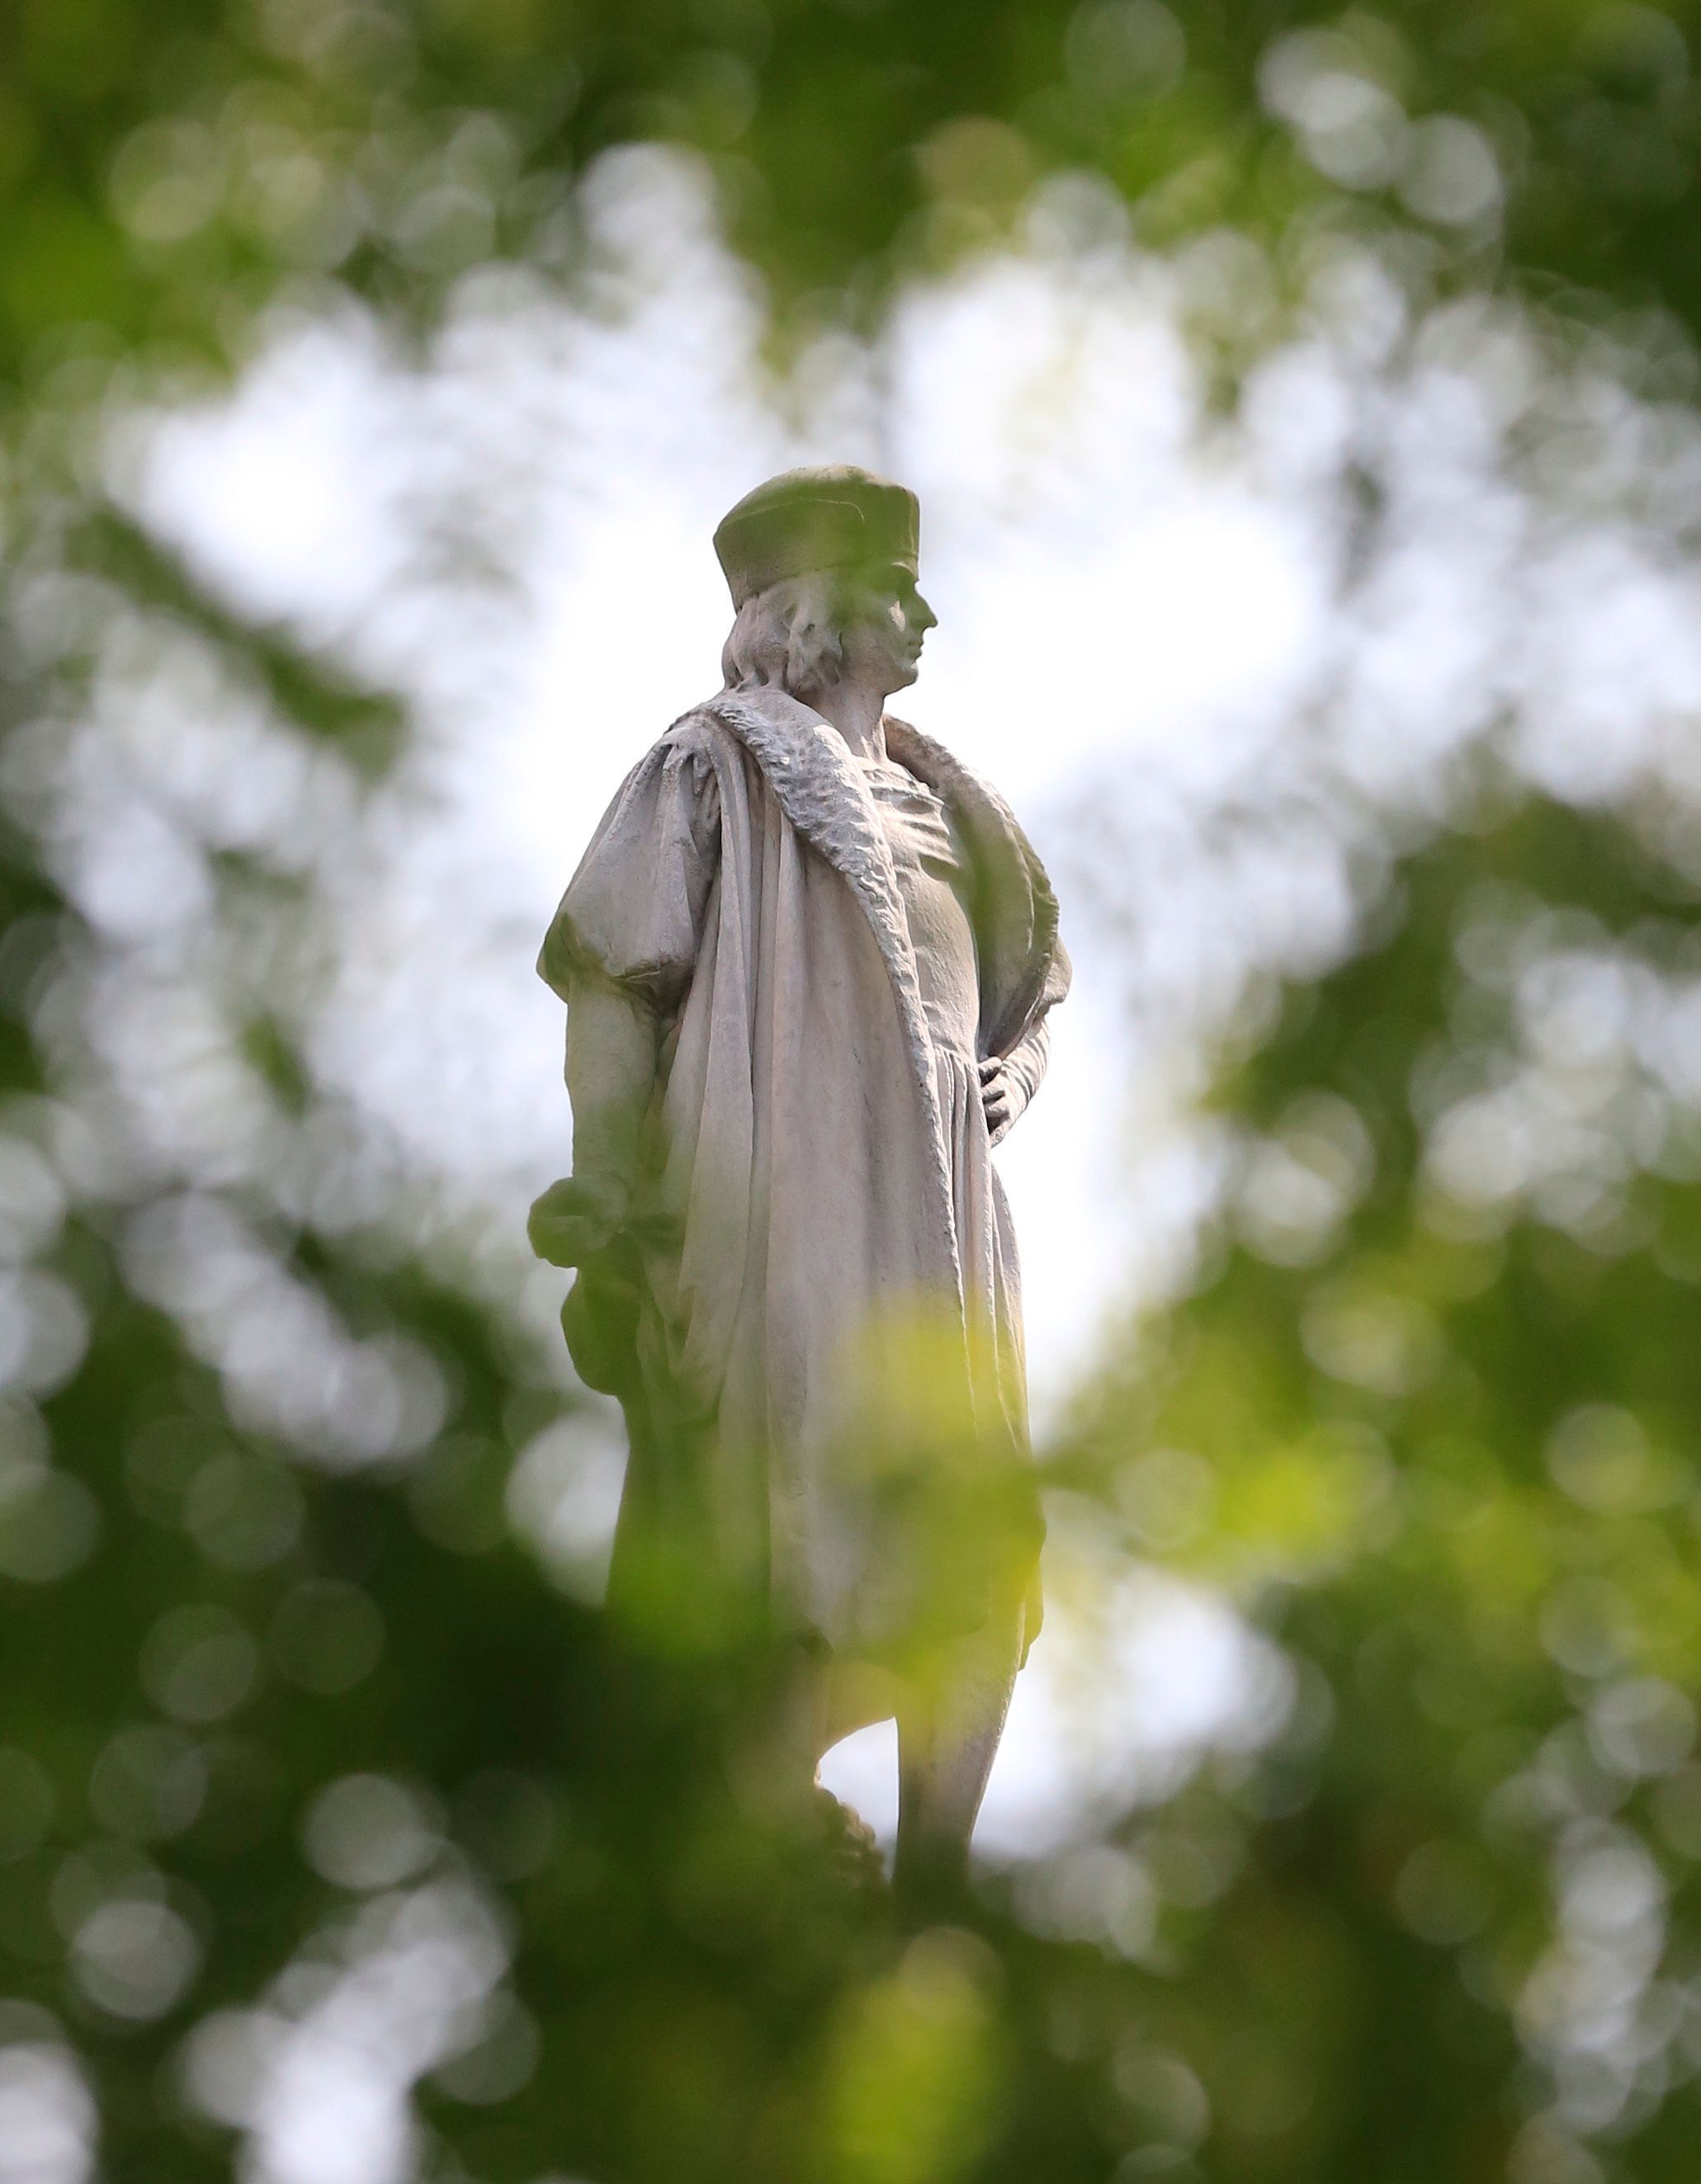 The Christopher Columbus statue is shown at Manhattan's Columbus Circle, Sunday Aug. 27, 2017, in New York. (AP Photo/Bebeto Matthews)